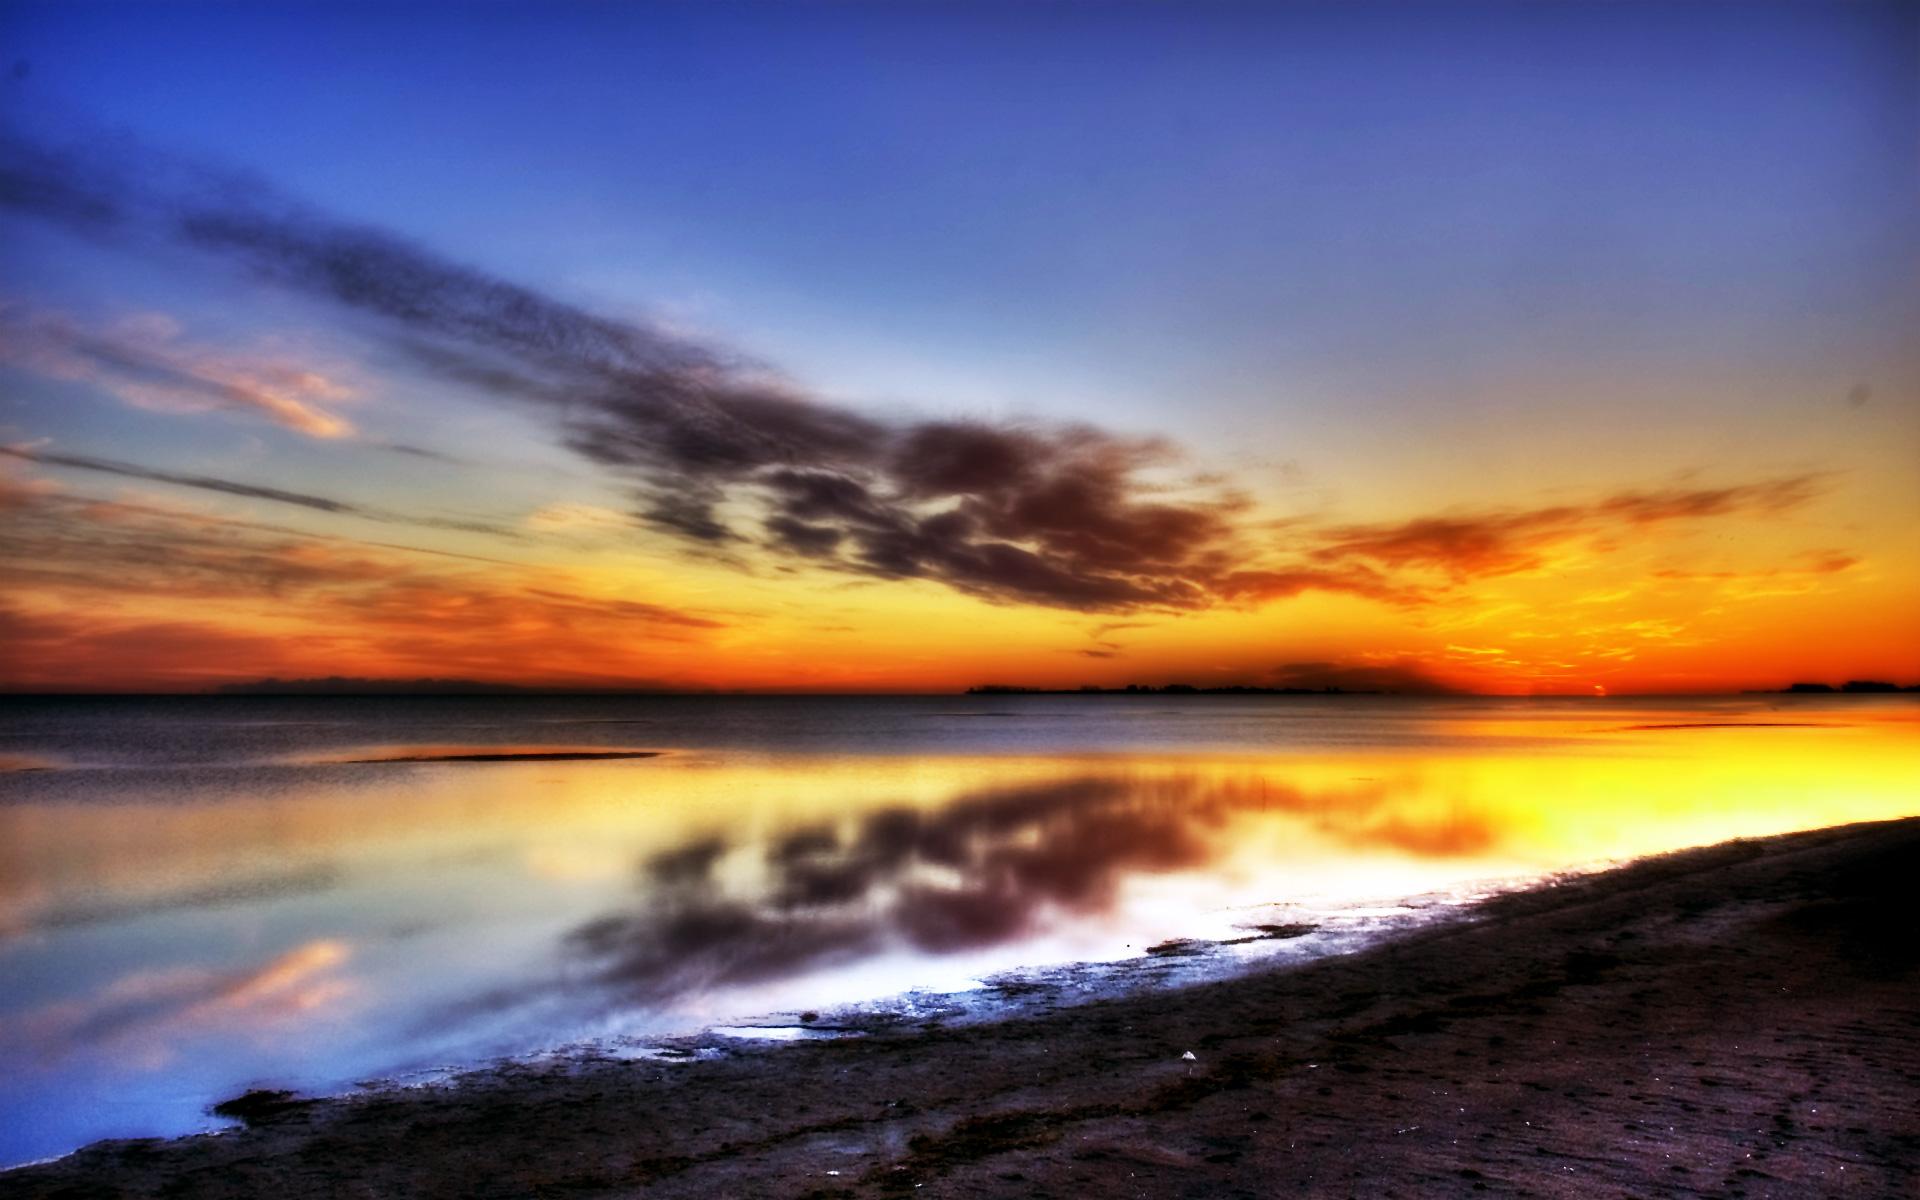 beach sunset 1920x1200 2314 - photo #21